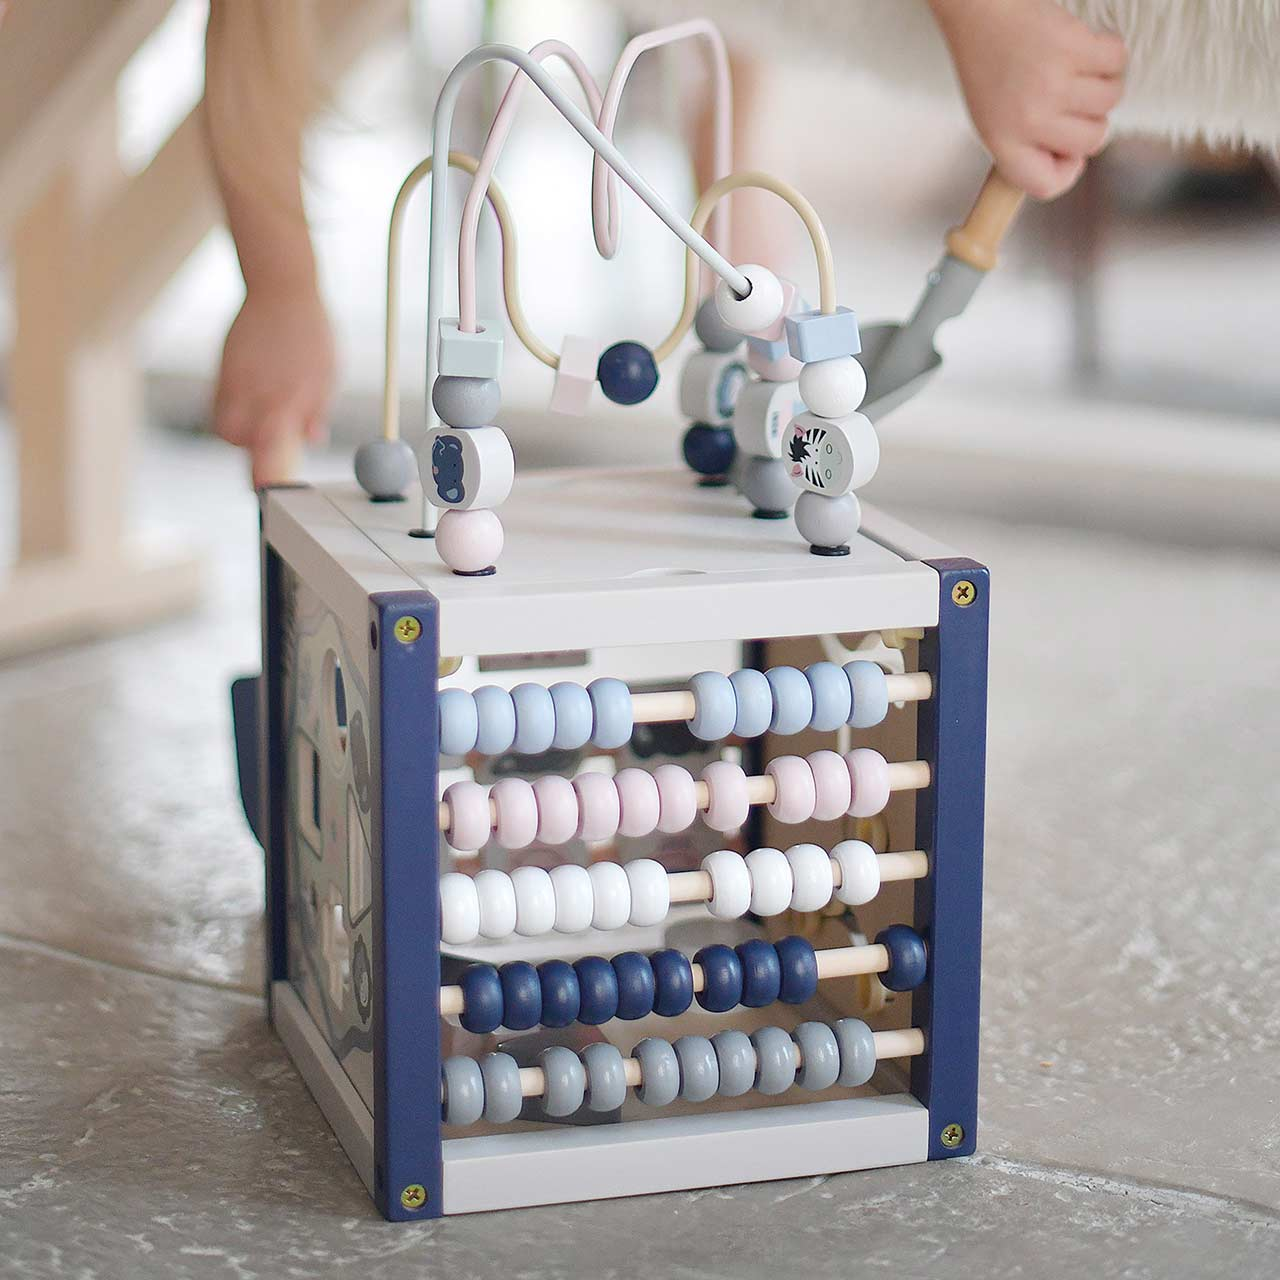 EverEarth Spielzeug Handy aus Holz, Maße 2,5 x 8,55 x 13,5 cm